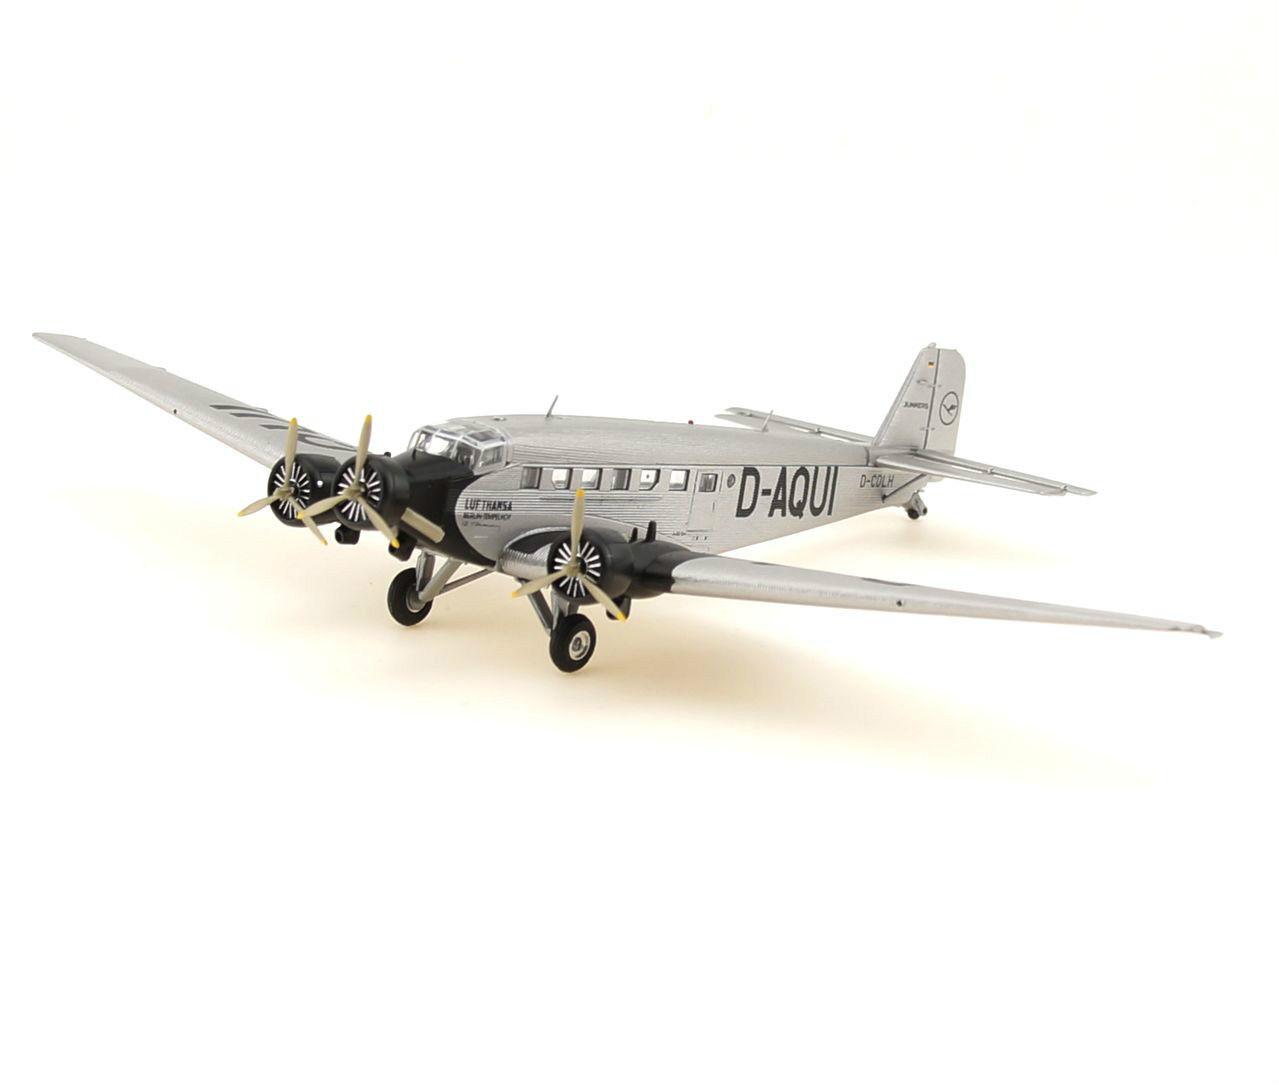 Herpa 1 160 - 019040  Junkers ju-52  Lufthansa  BERLIN TEMPELHOF-NEUF + neuf dans sa boîte